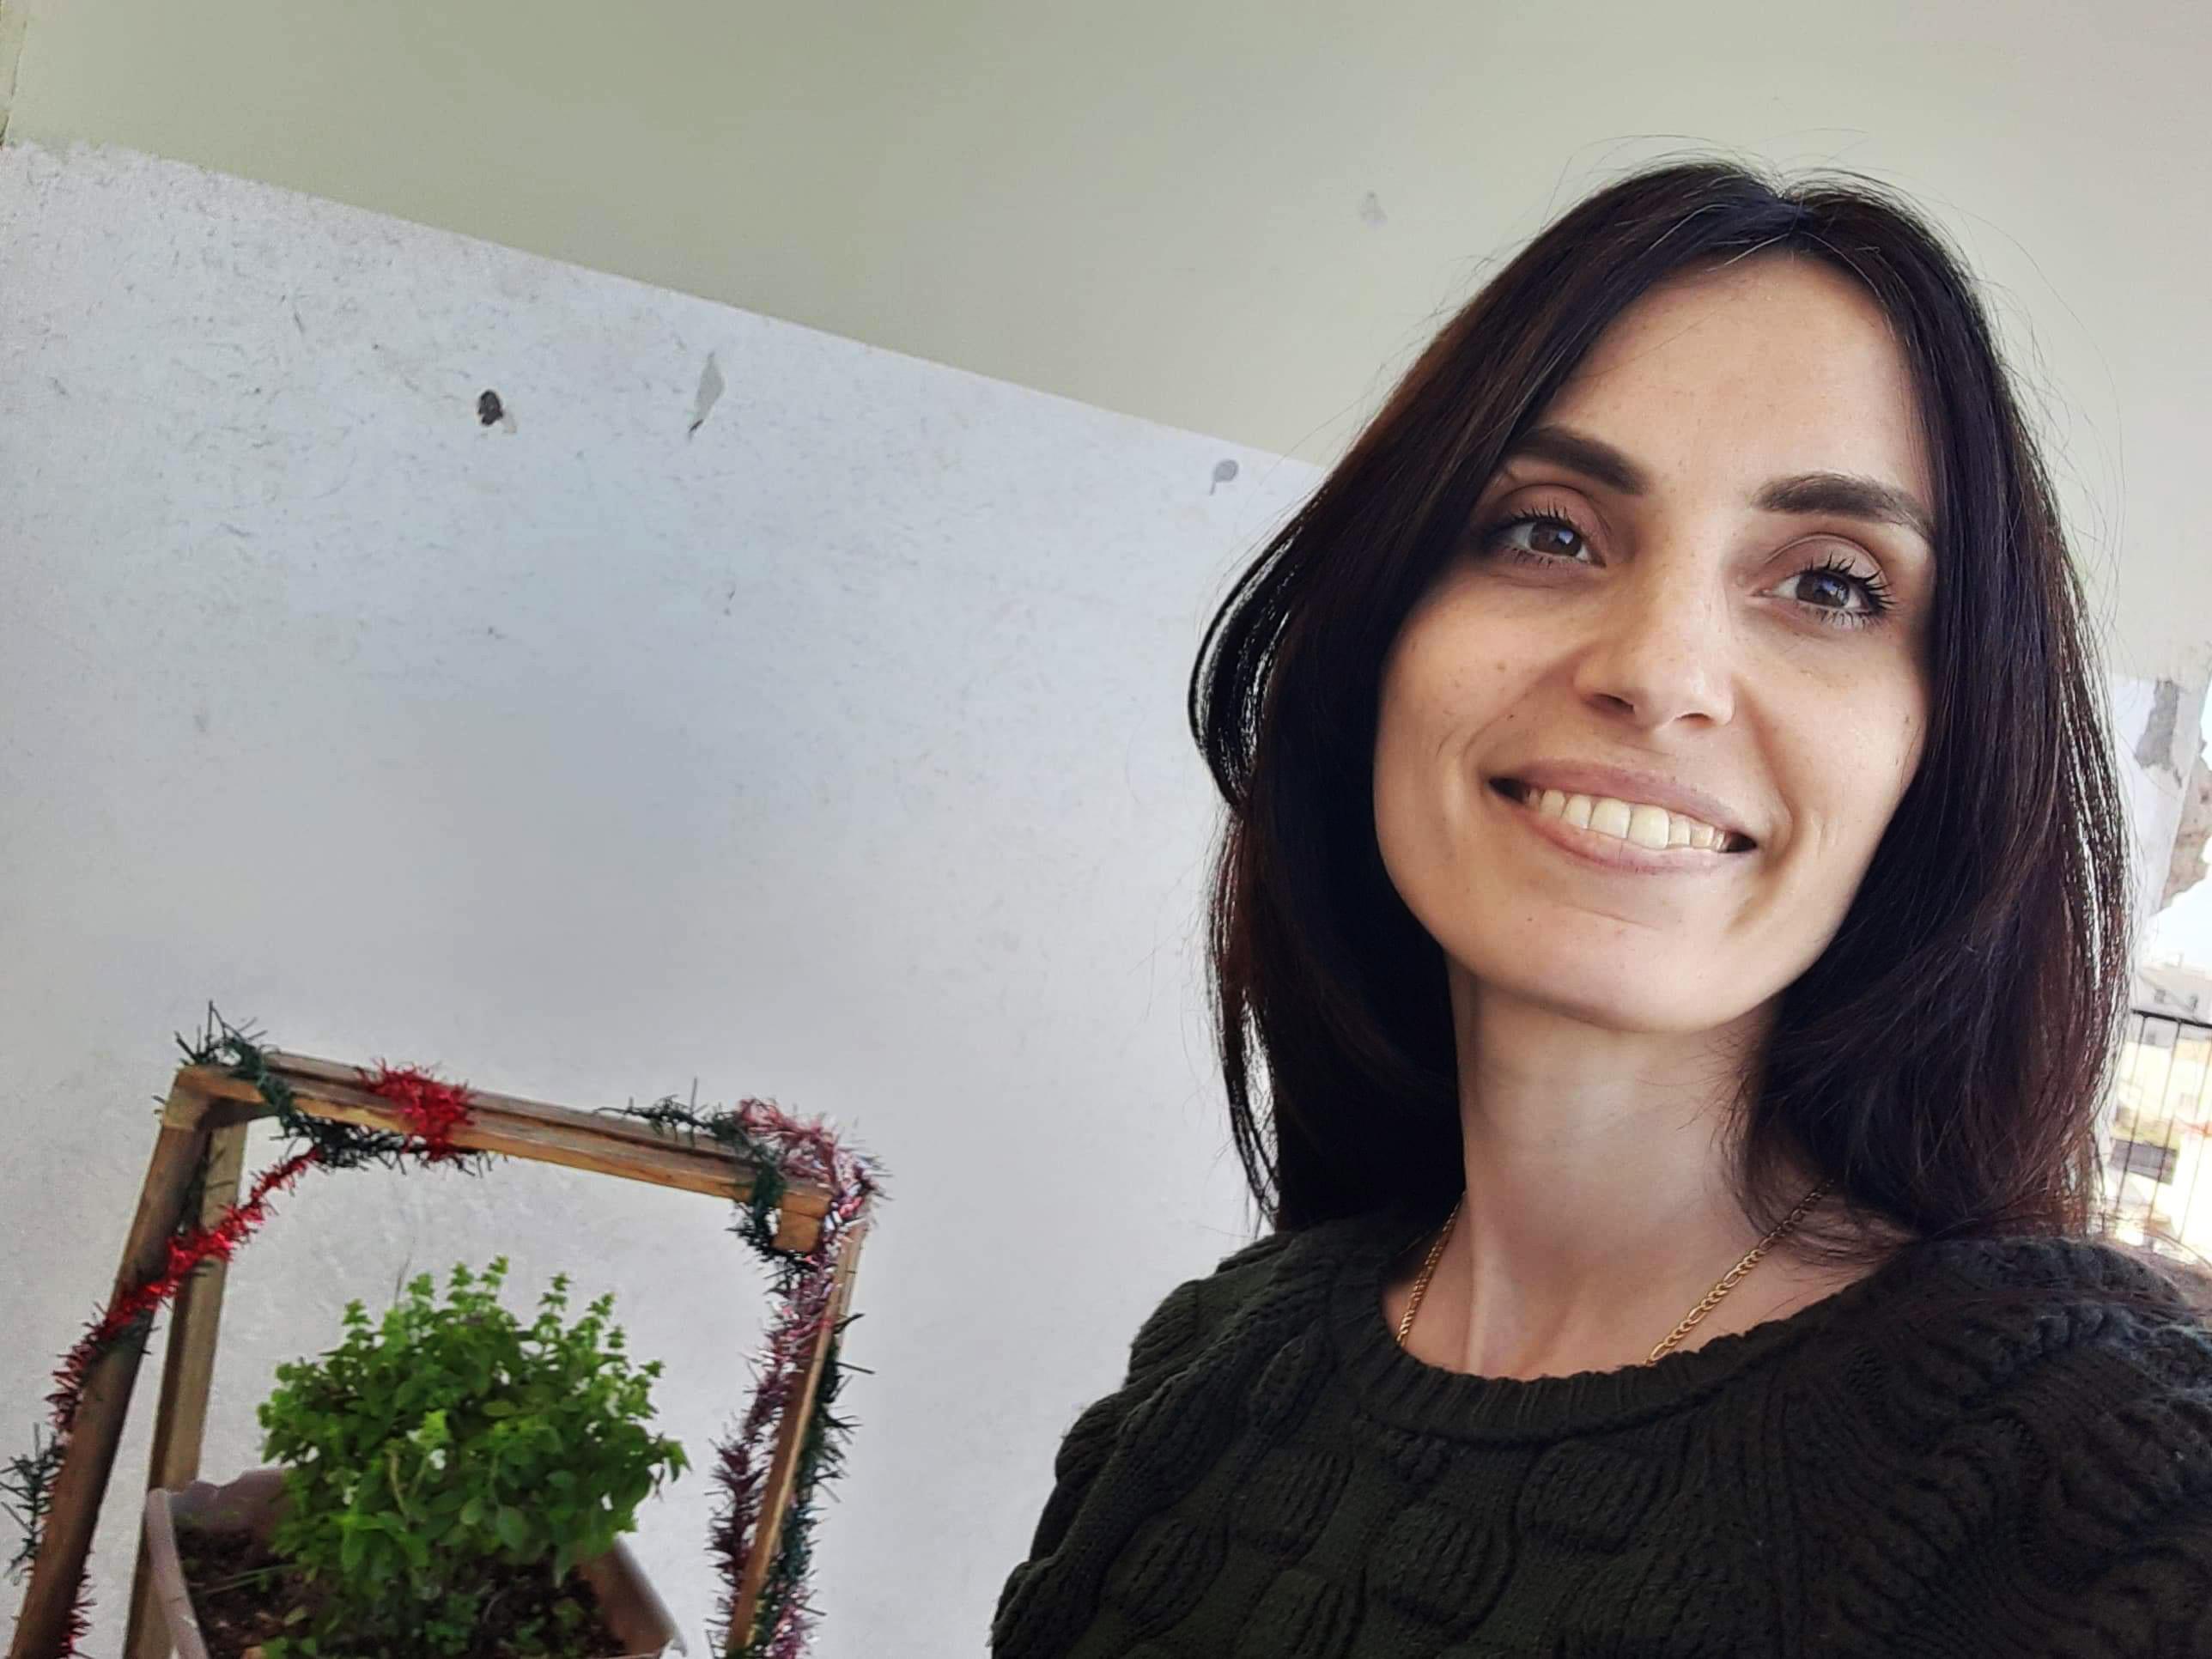 Meet Marsail Al-Jilda our Student from Gaza